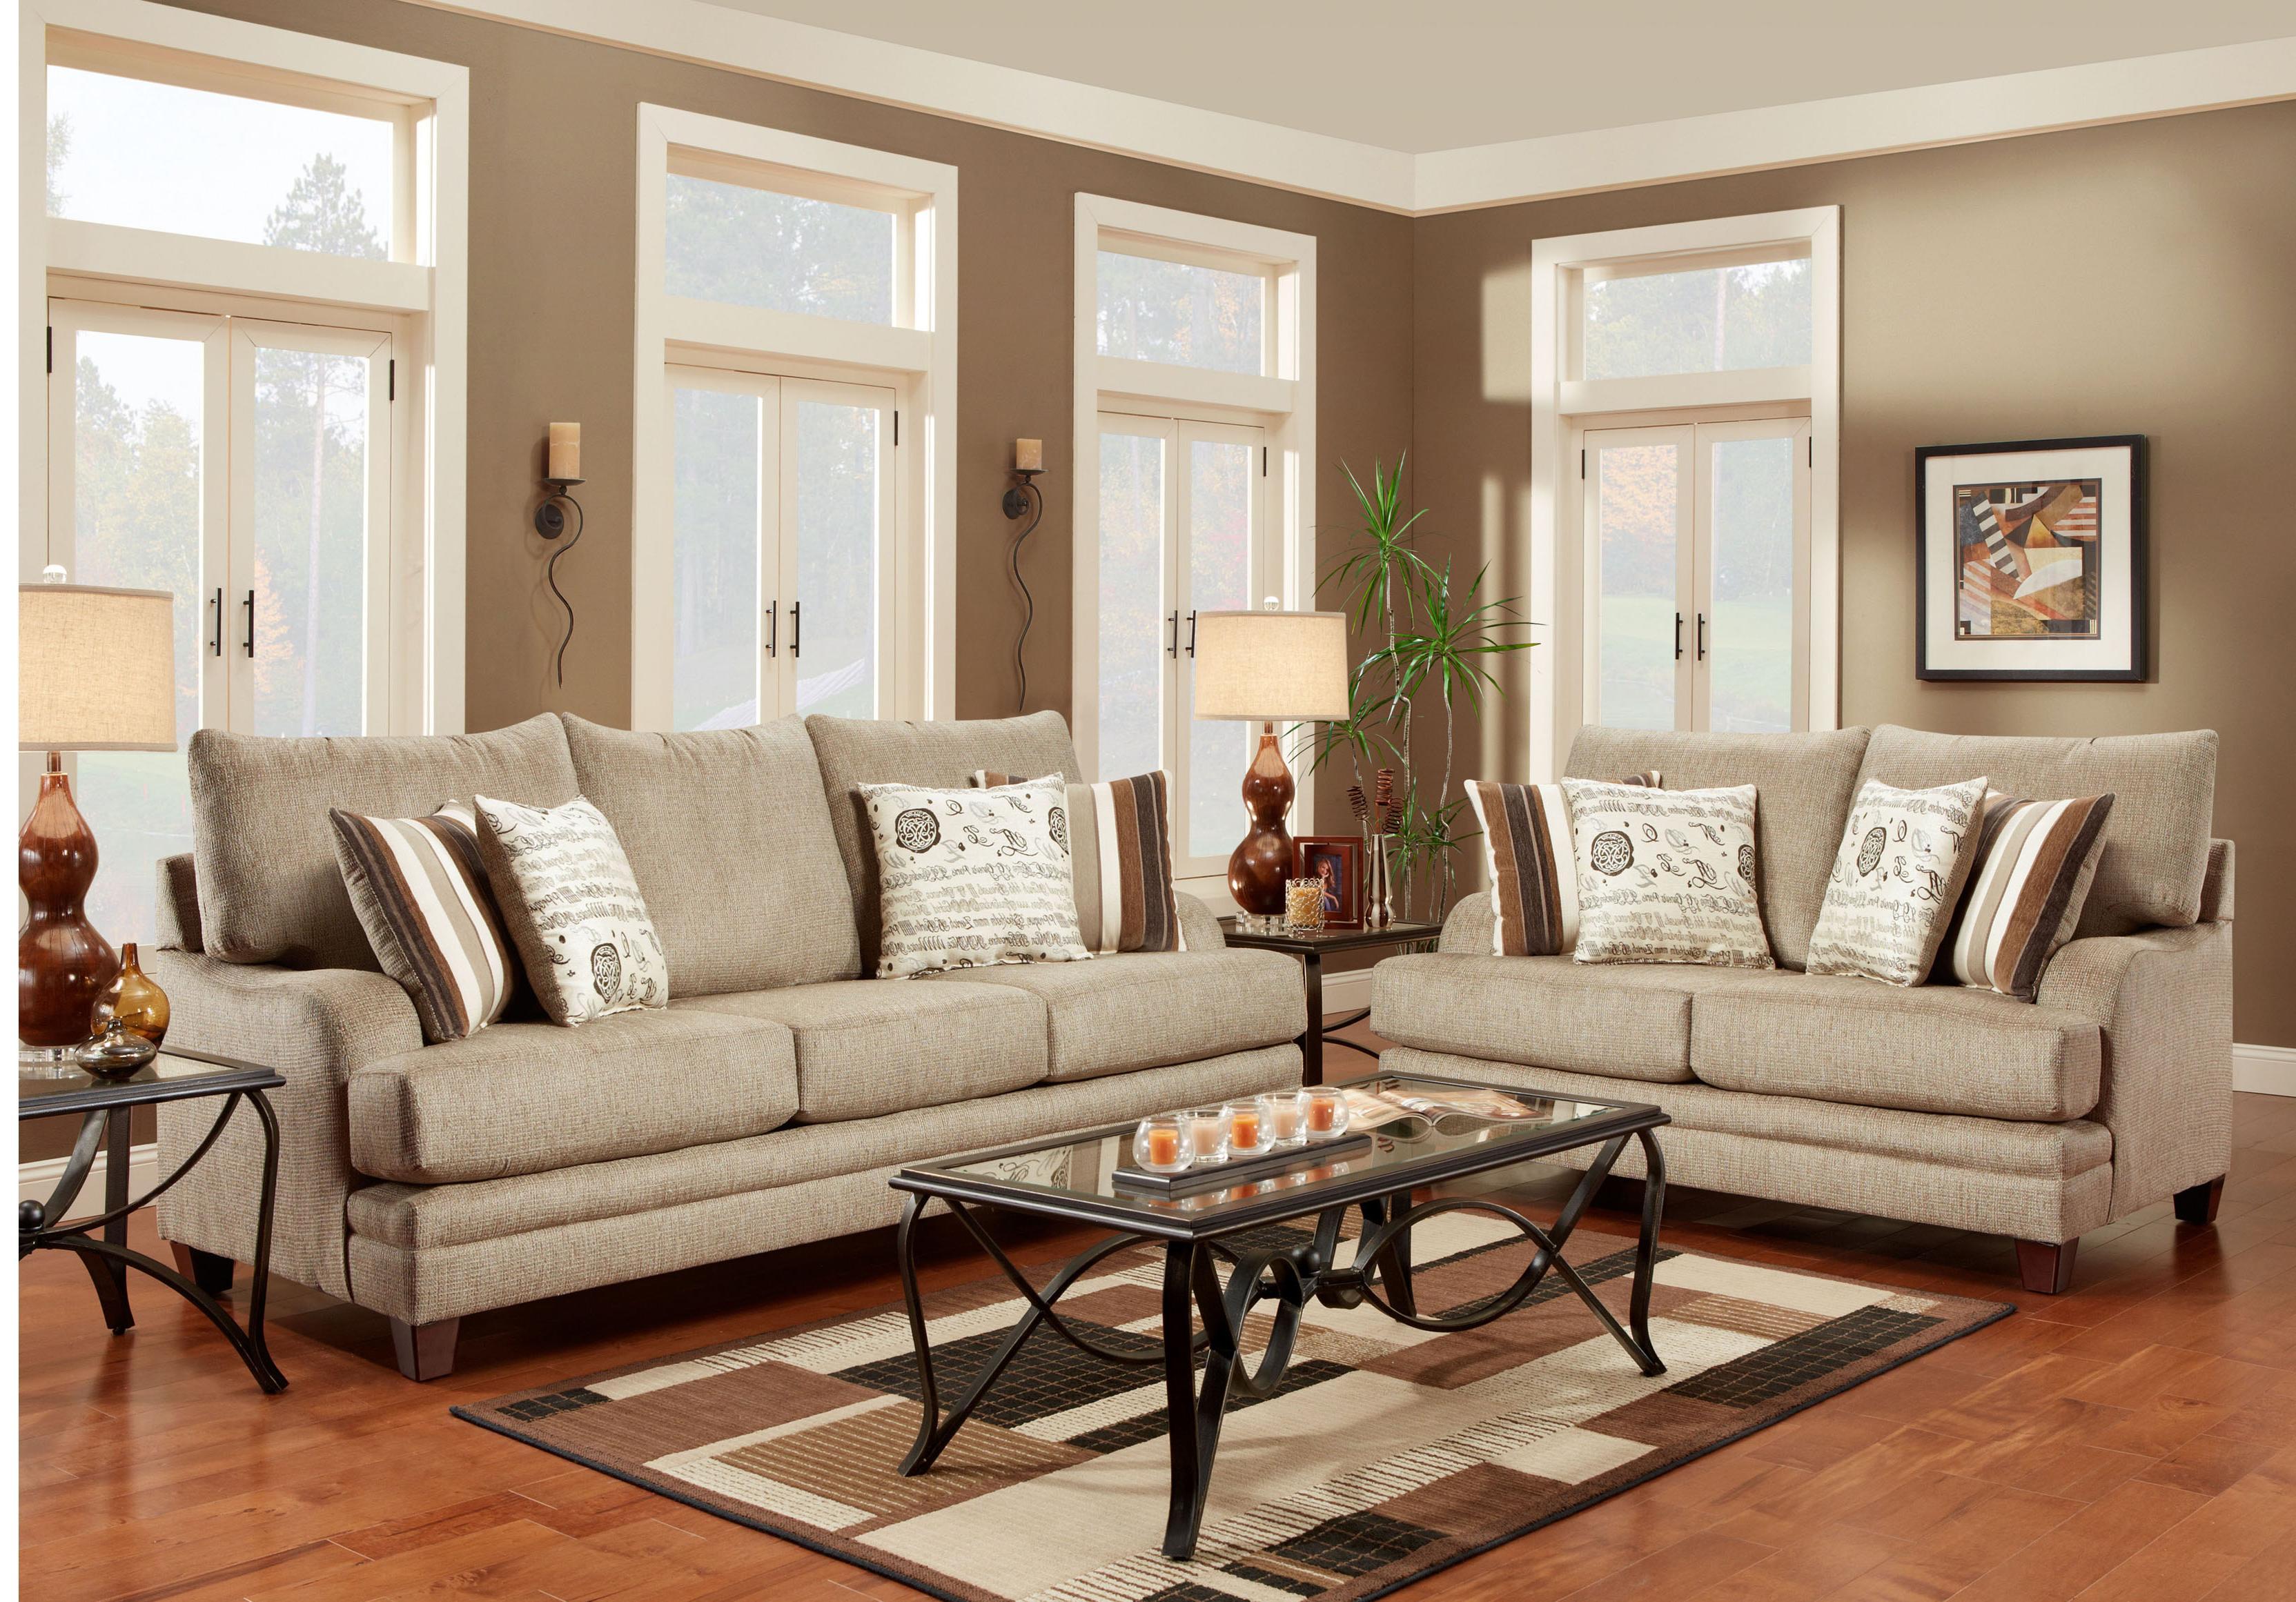 2230 Stationary Living Room Group by Washington Furniture at Lynn's Furniture & Mattress